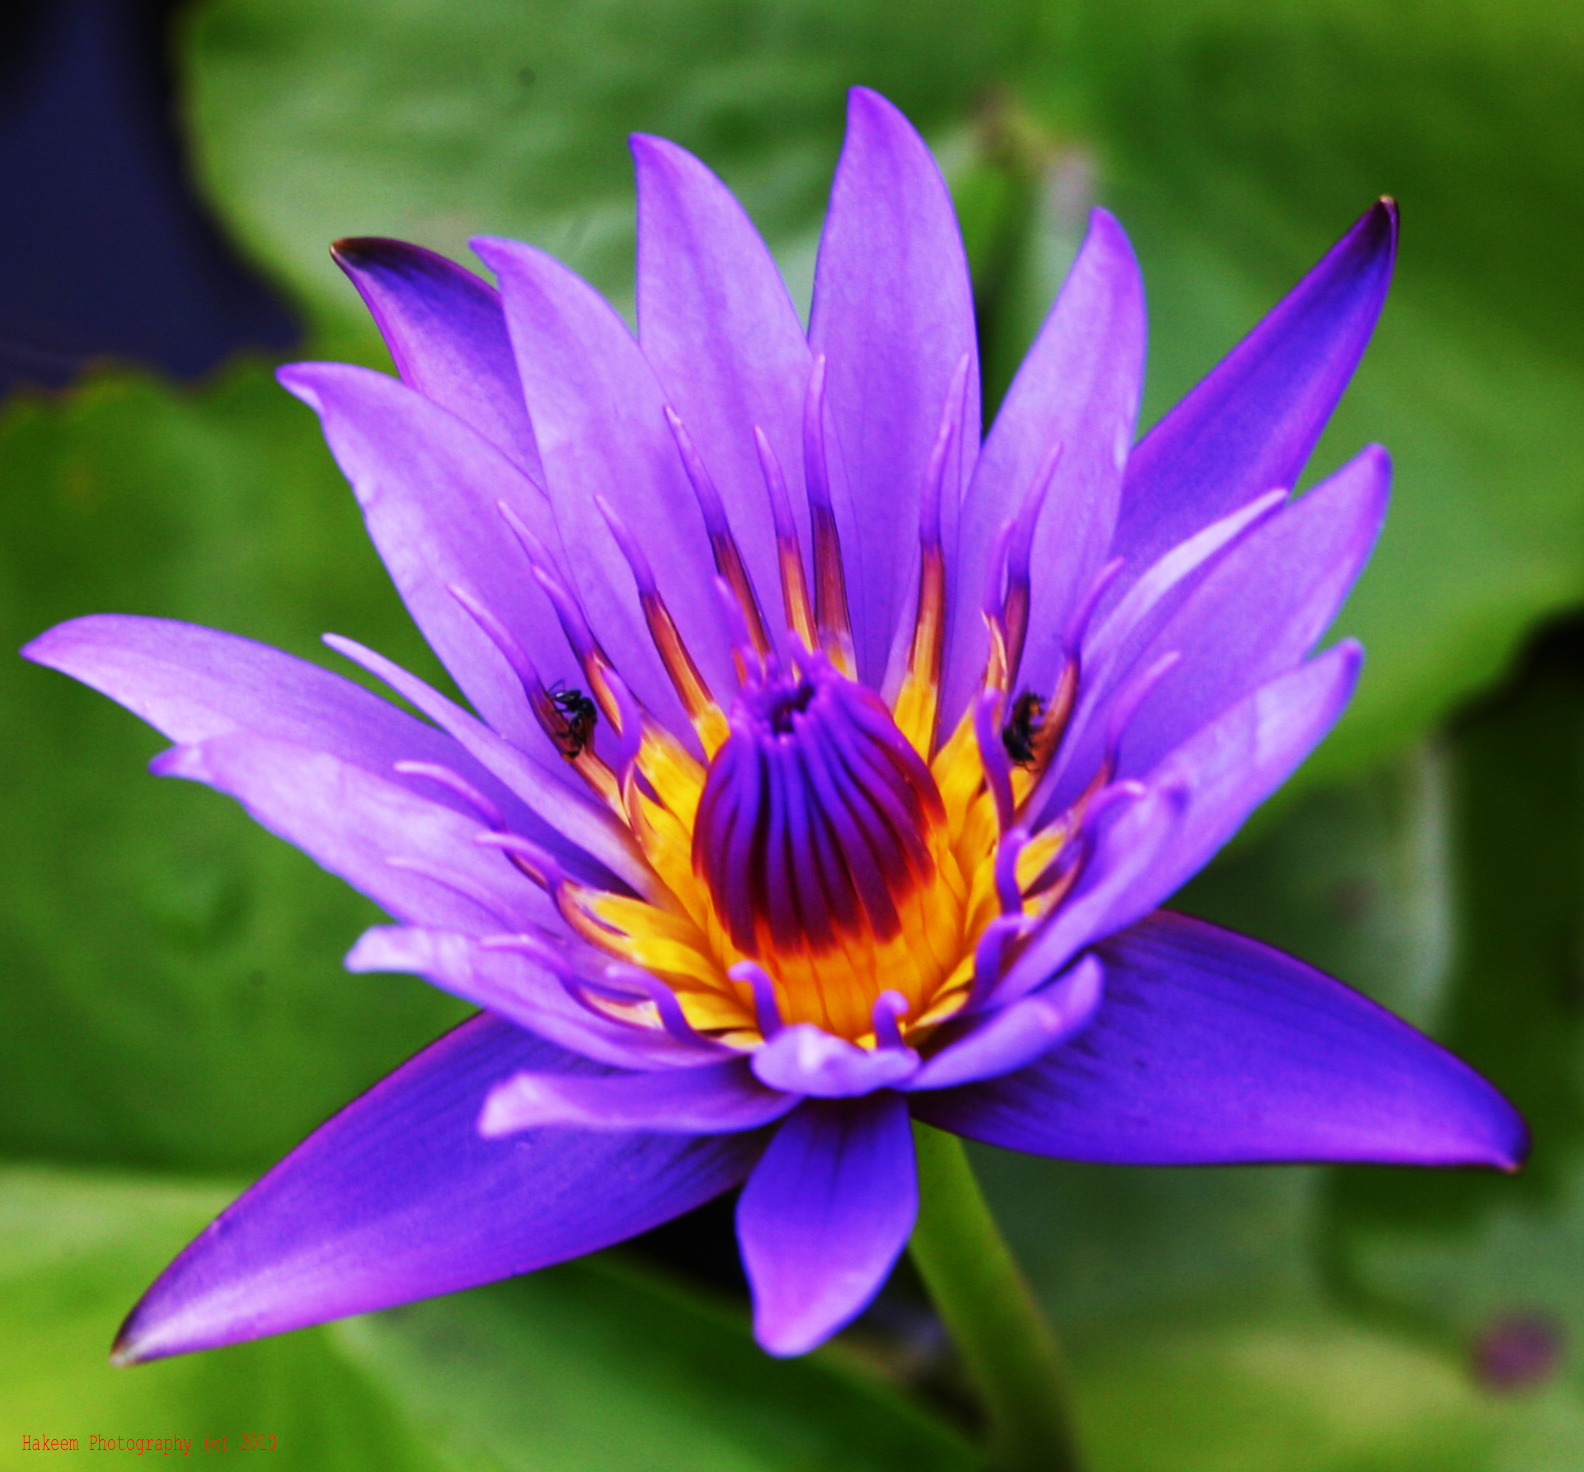 Hakeem Photography: Lotus With Purple Flowers